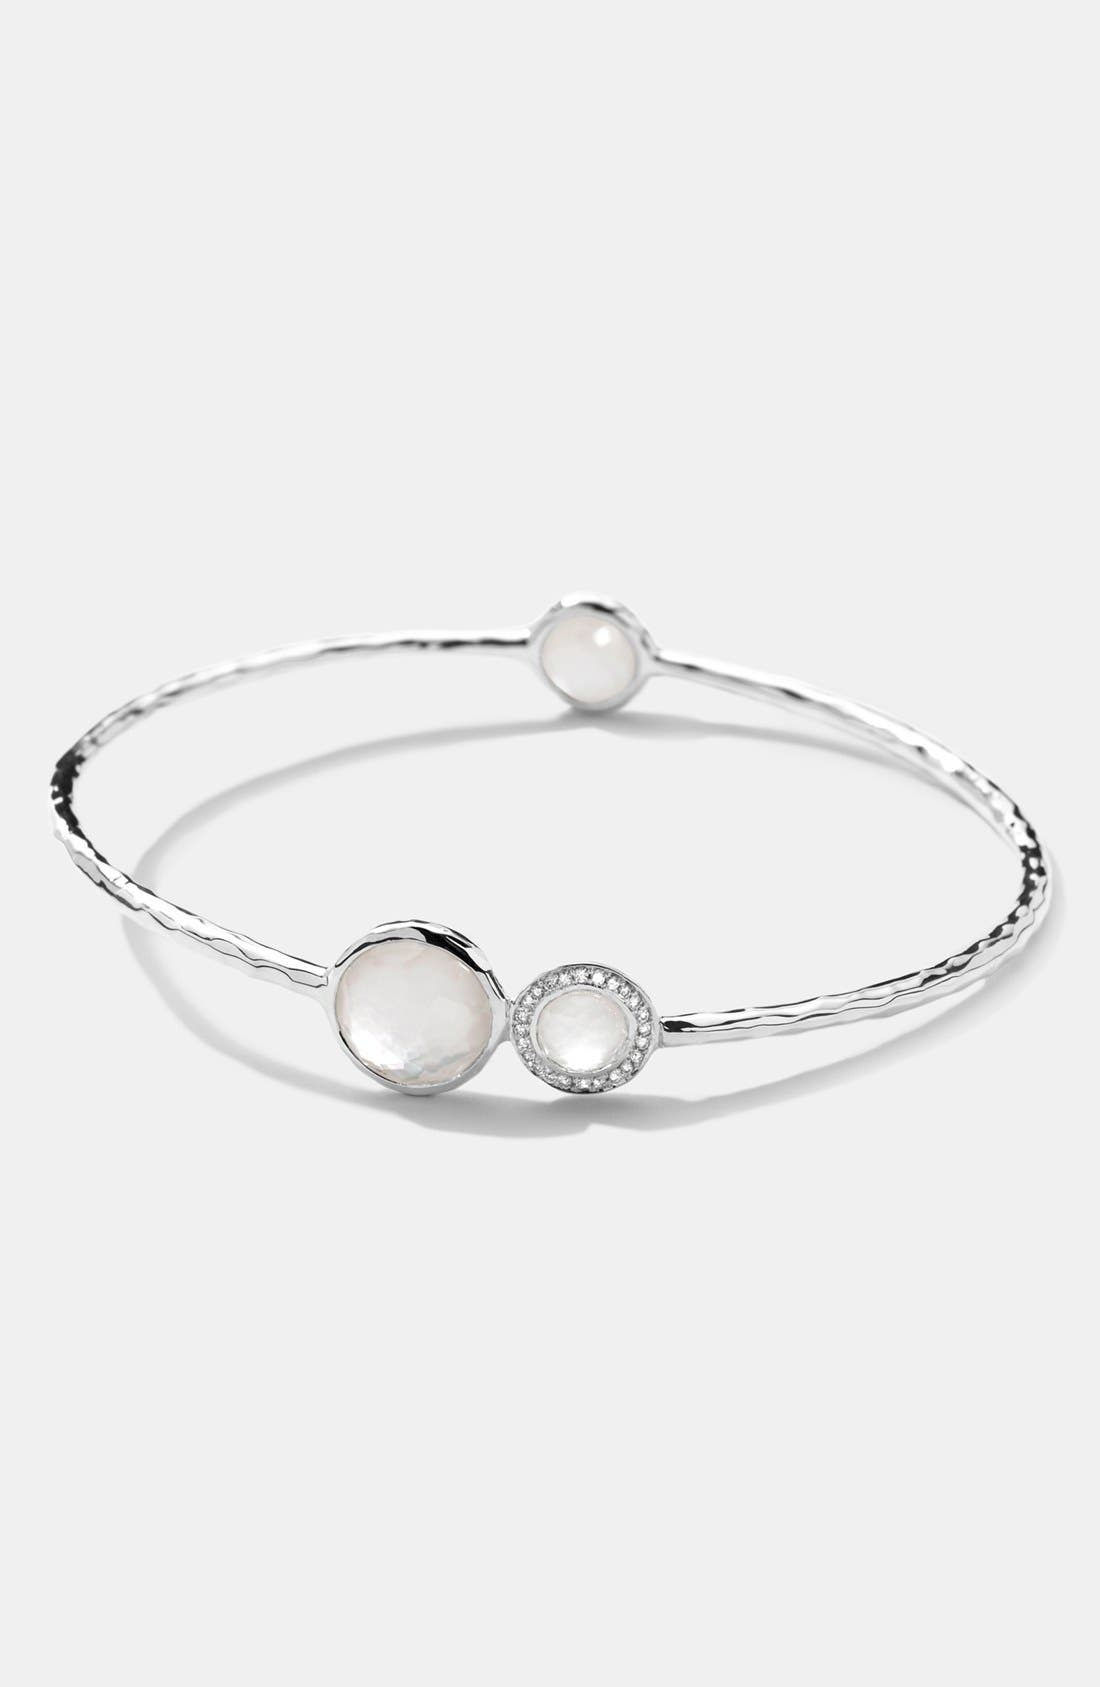 Main Image - Ippolita 'Stella' 3-Stone & Diamond Bangle